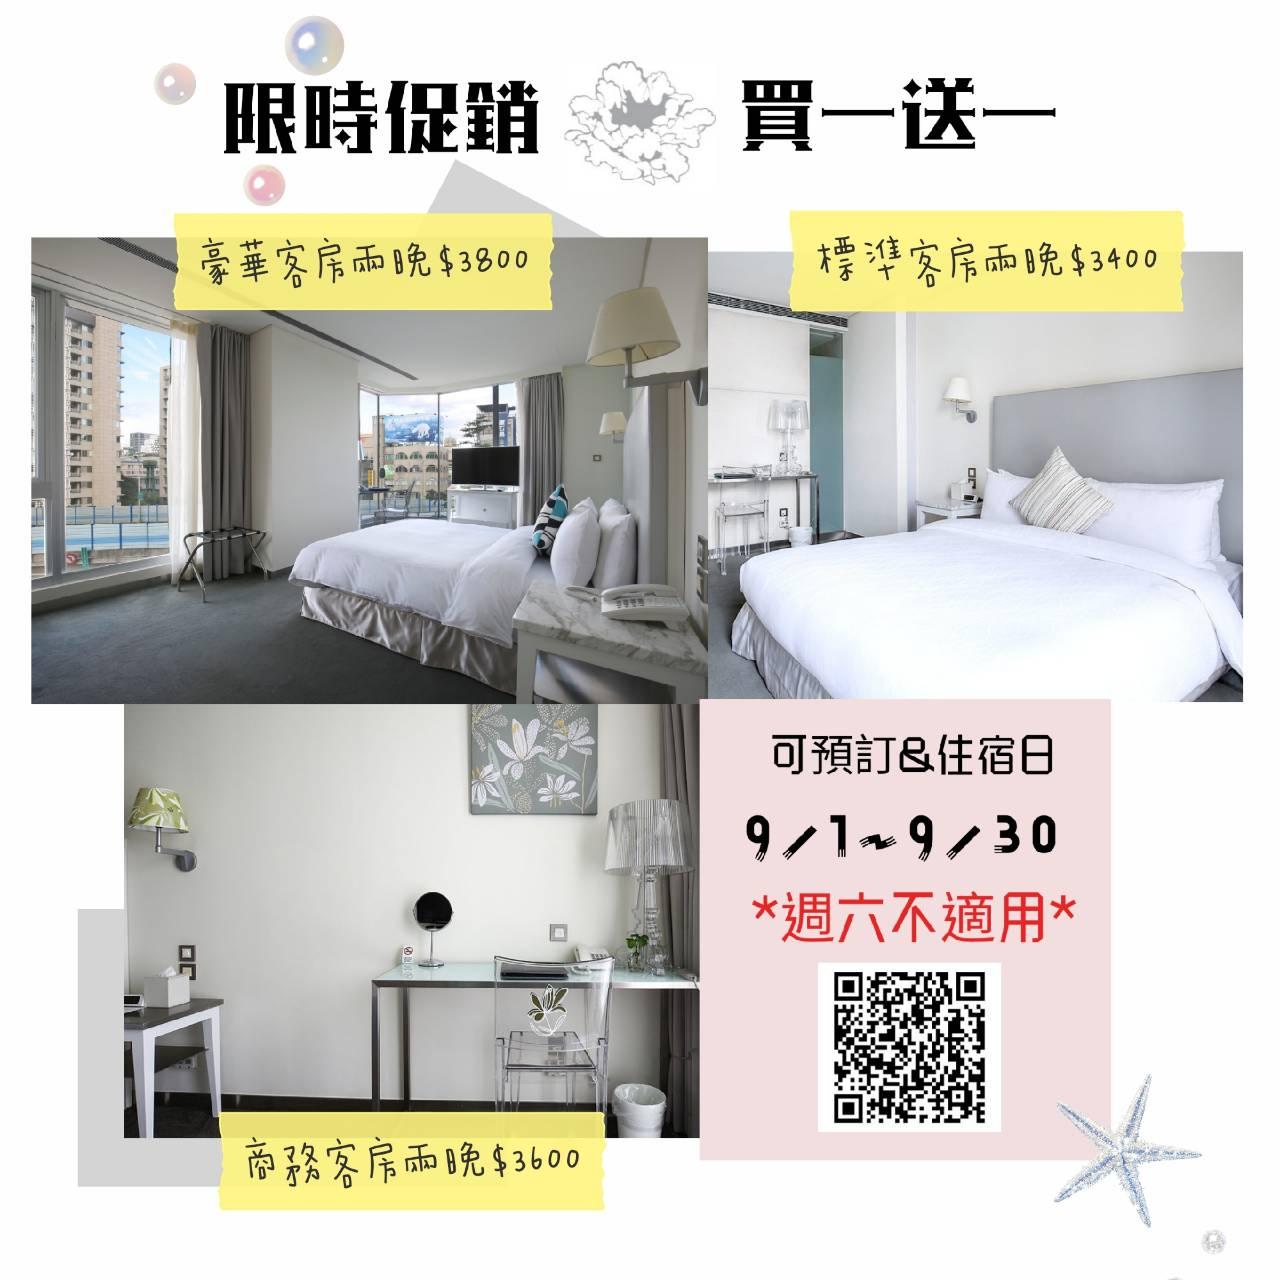 https://booking.taipeiinngroup.com/nv/images/suite/741.jpg